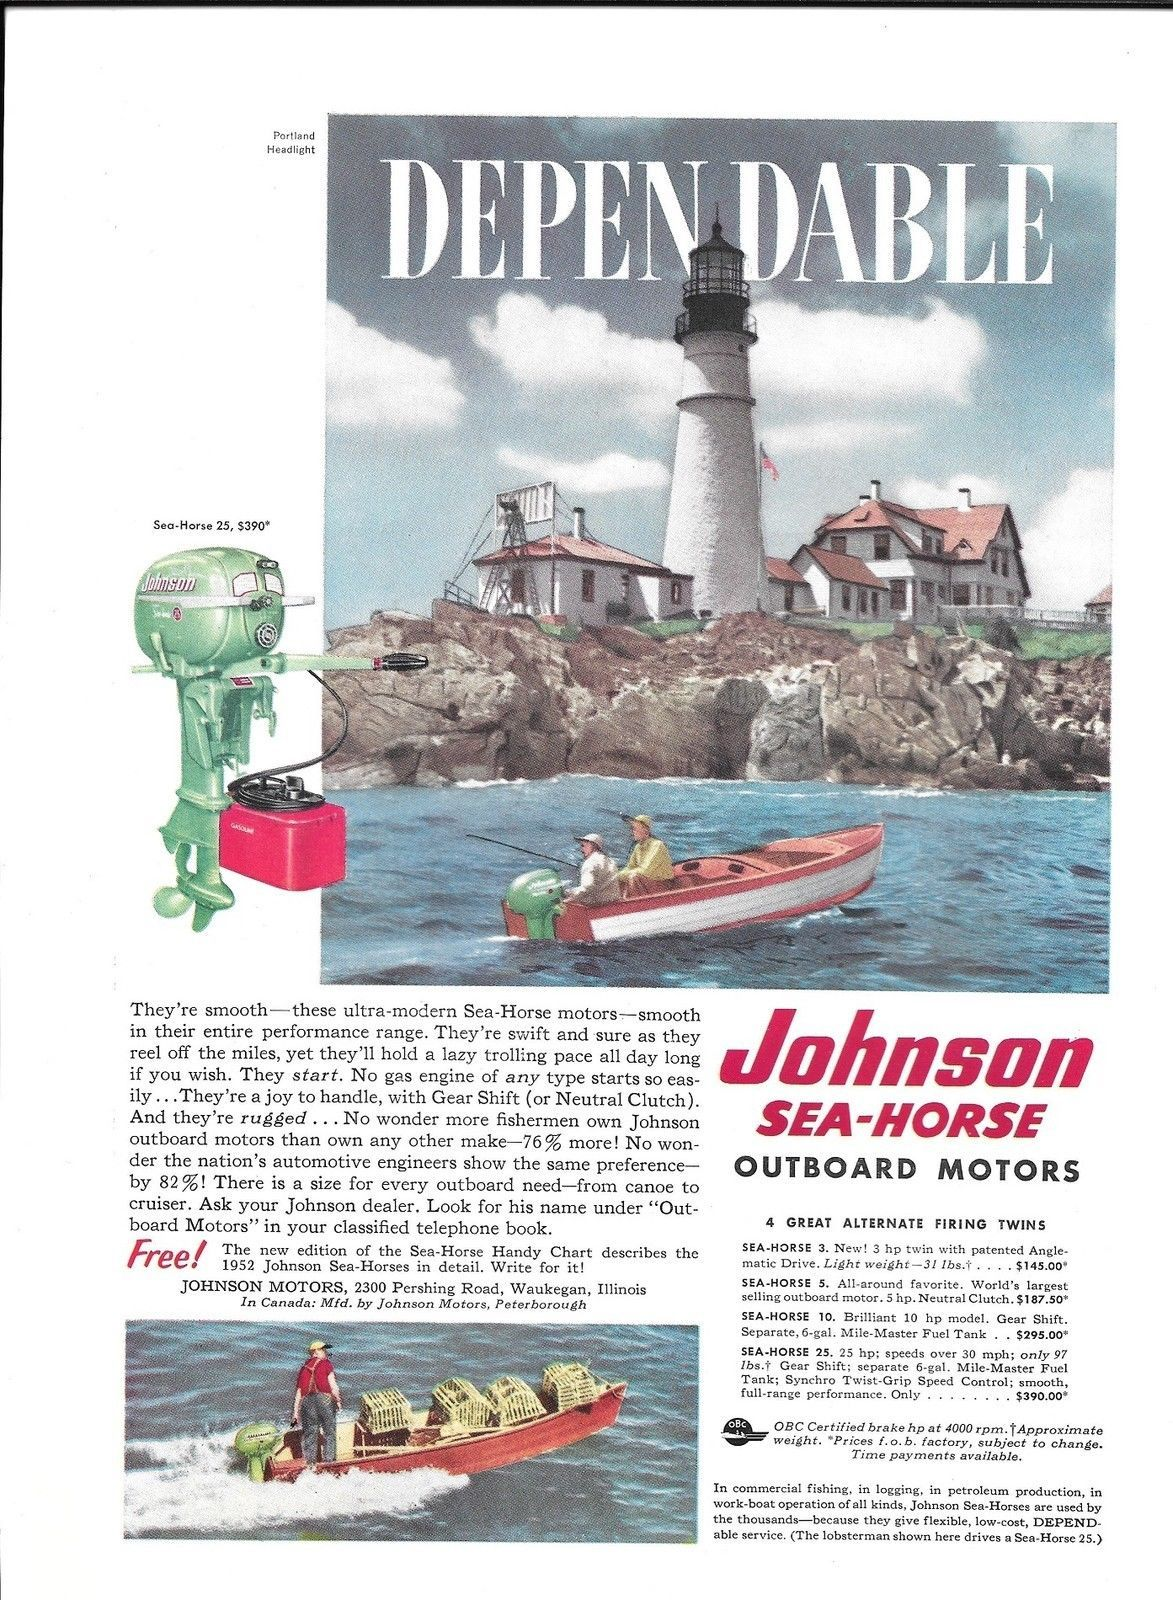 Johnson 25 hp outboard weight a Yamaha 2 stroke Manual